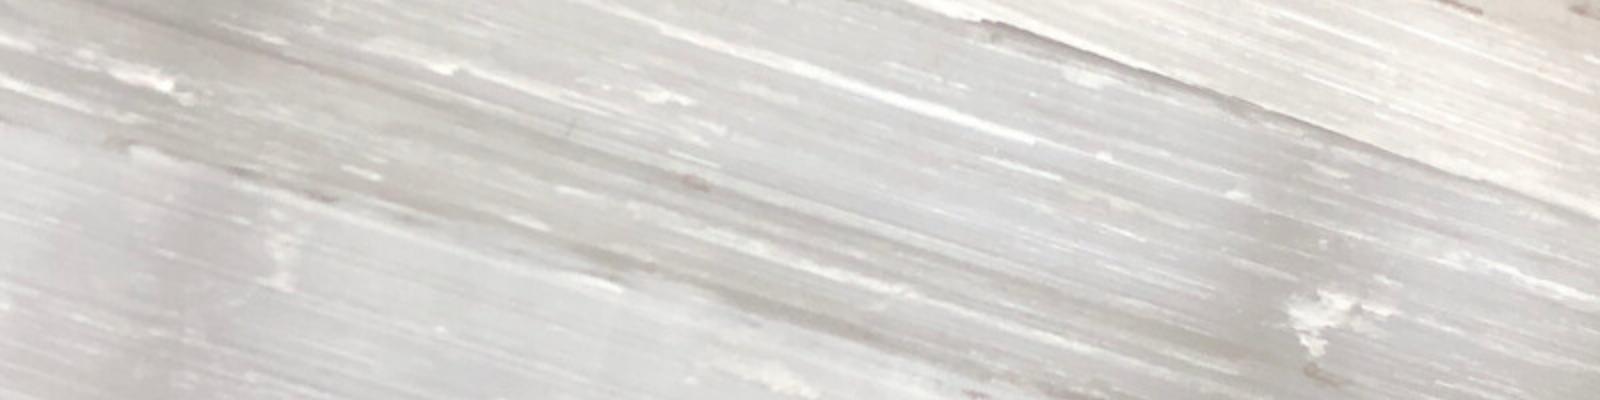 Copy of Copy of Copy of Copy of Banner - 2400 x 600 (2)